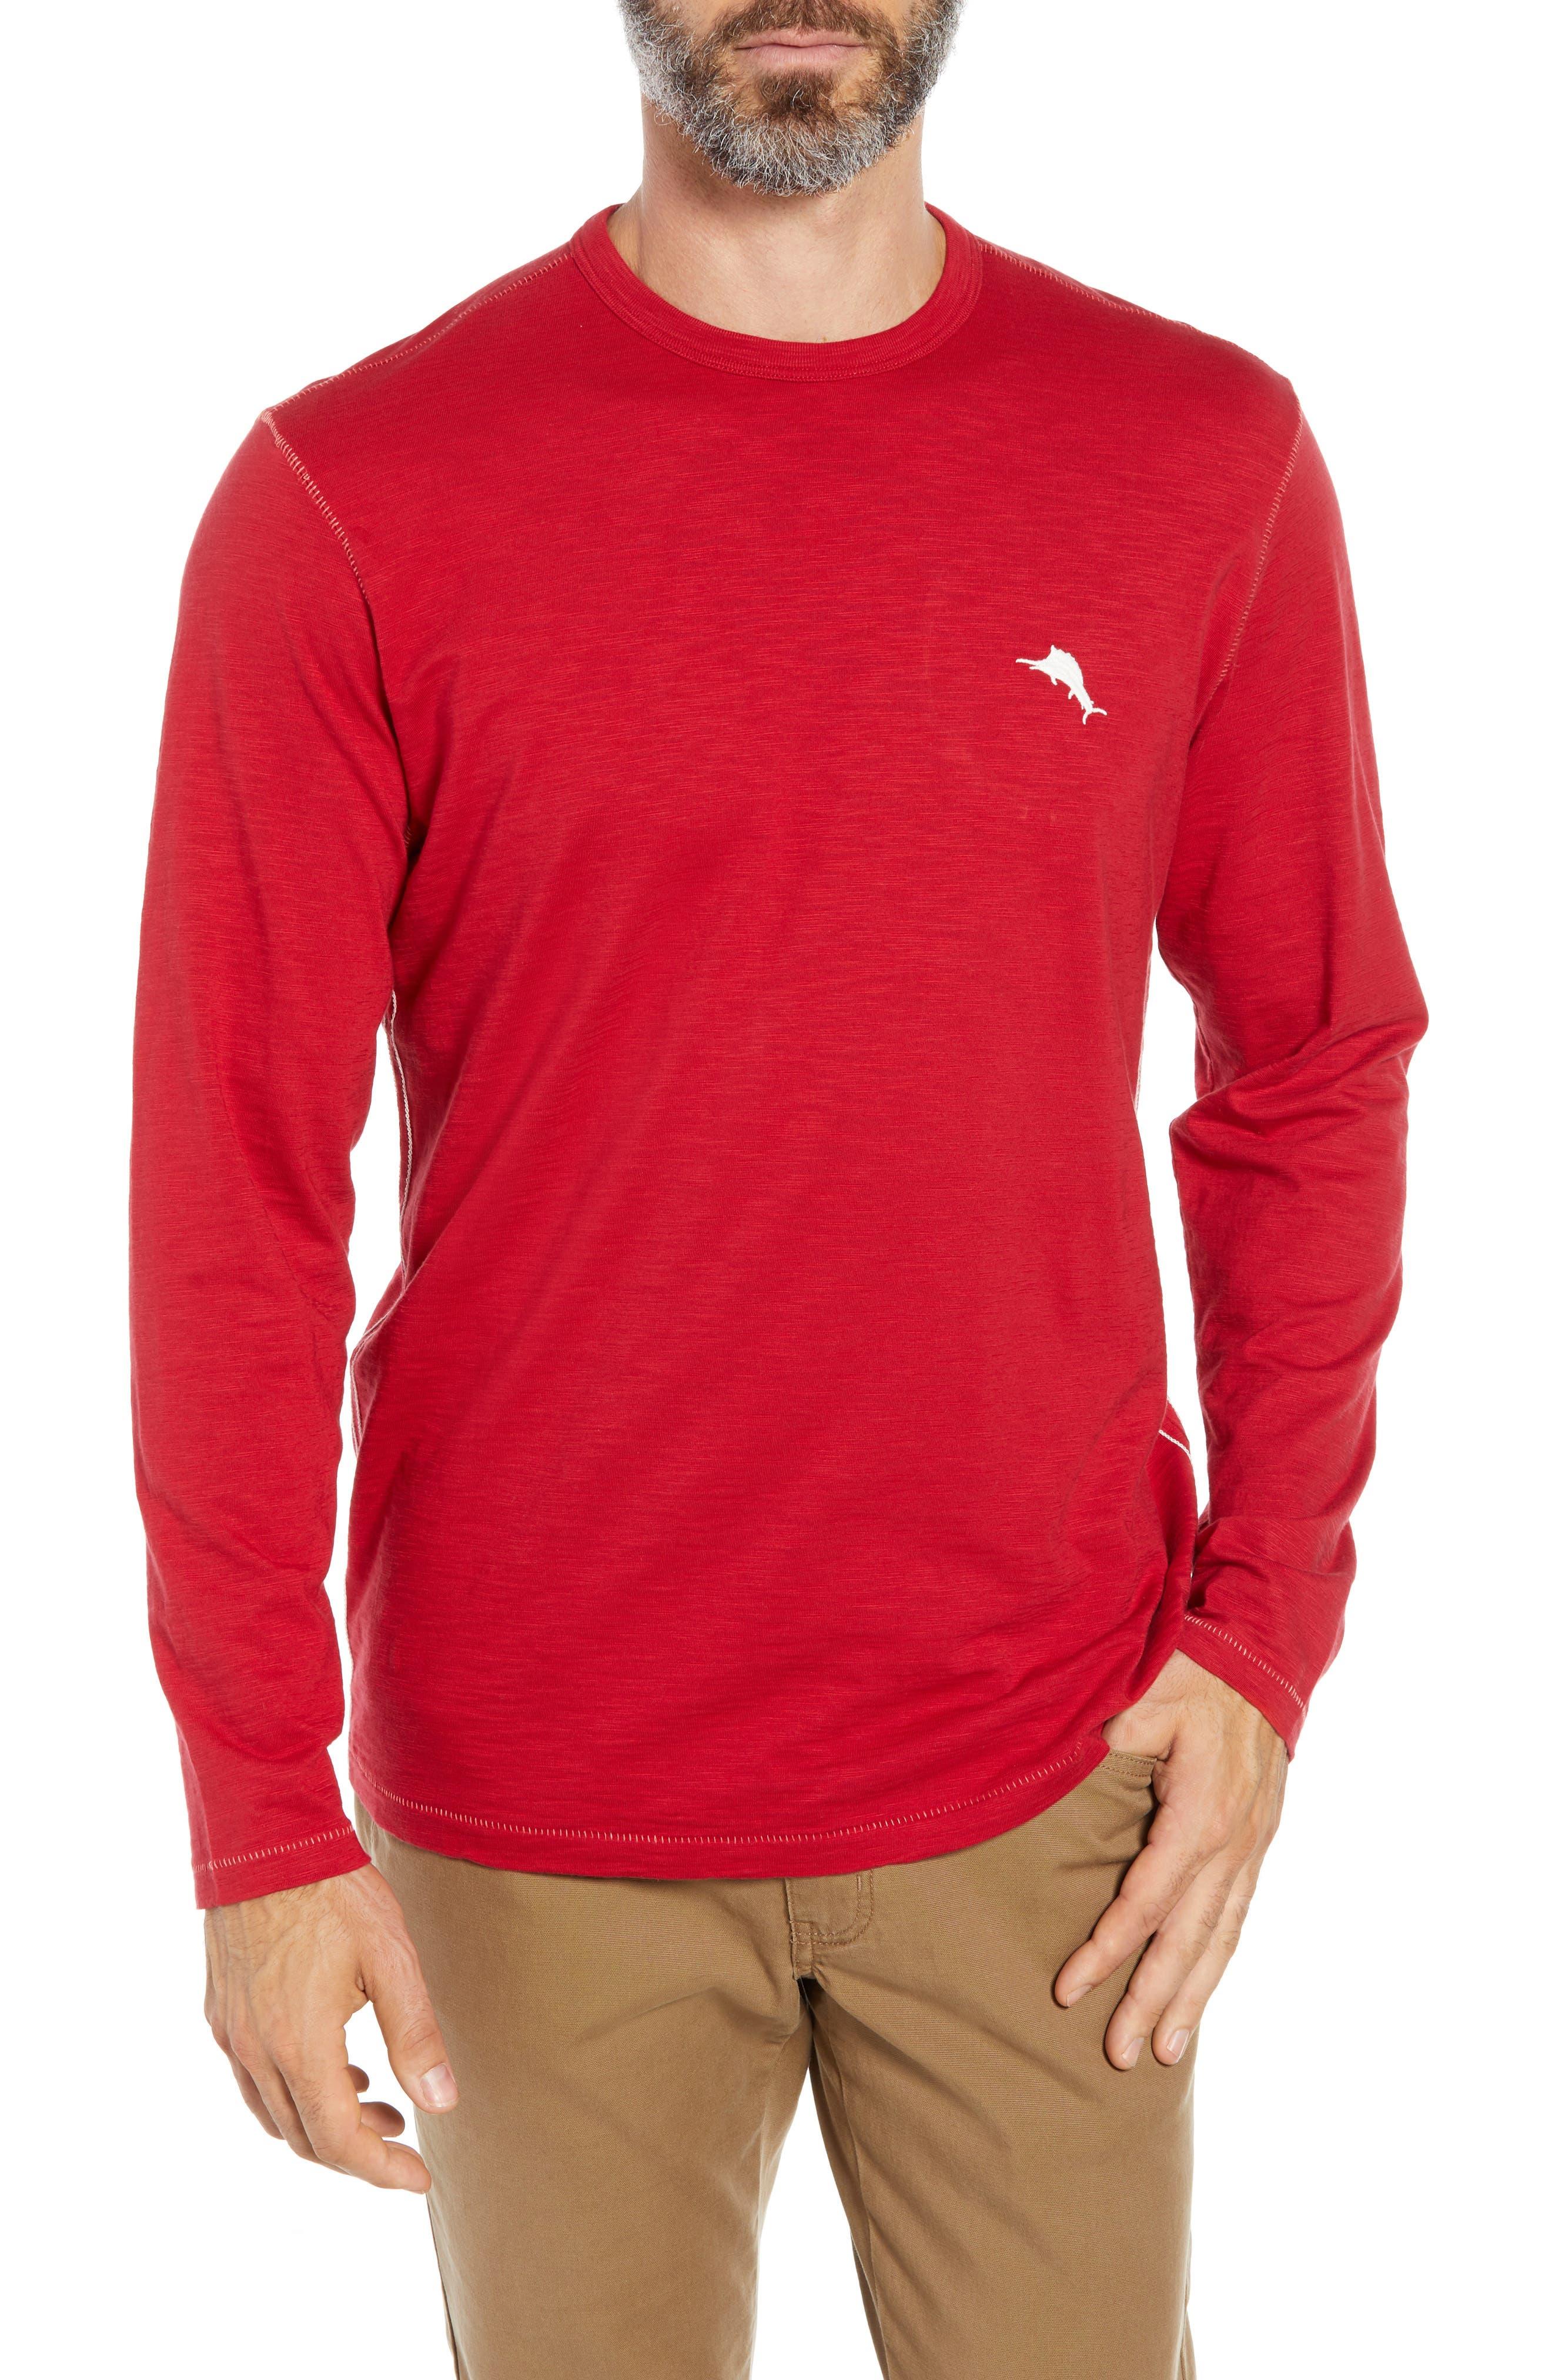 Mele Kalikimaka T-Shirt,                             Main thumbnail 1, color,                             SCOOTER RED